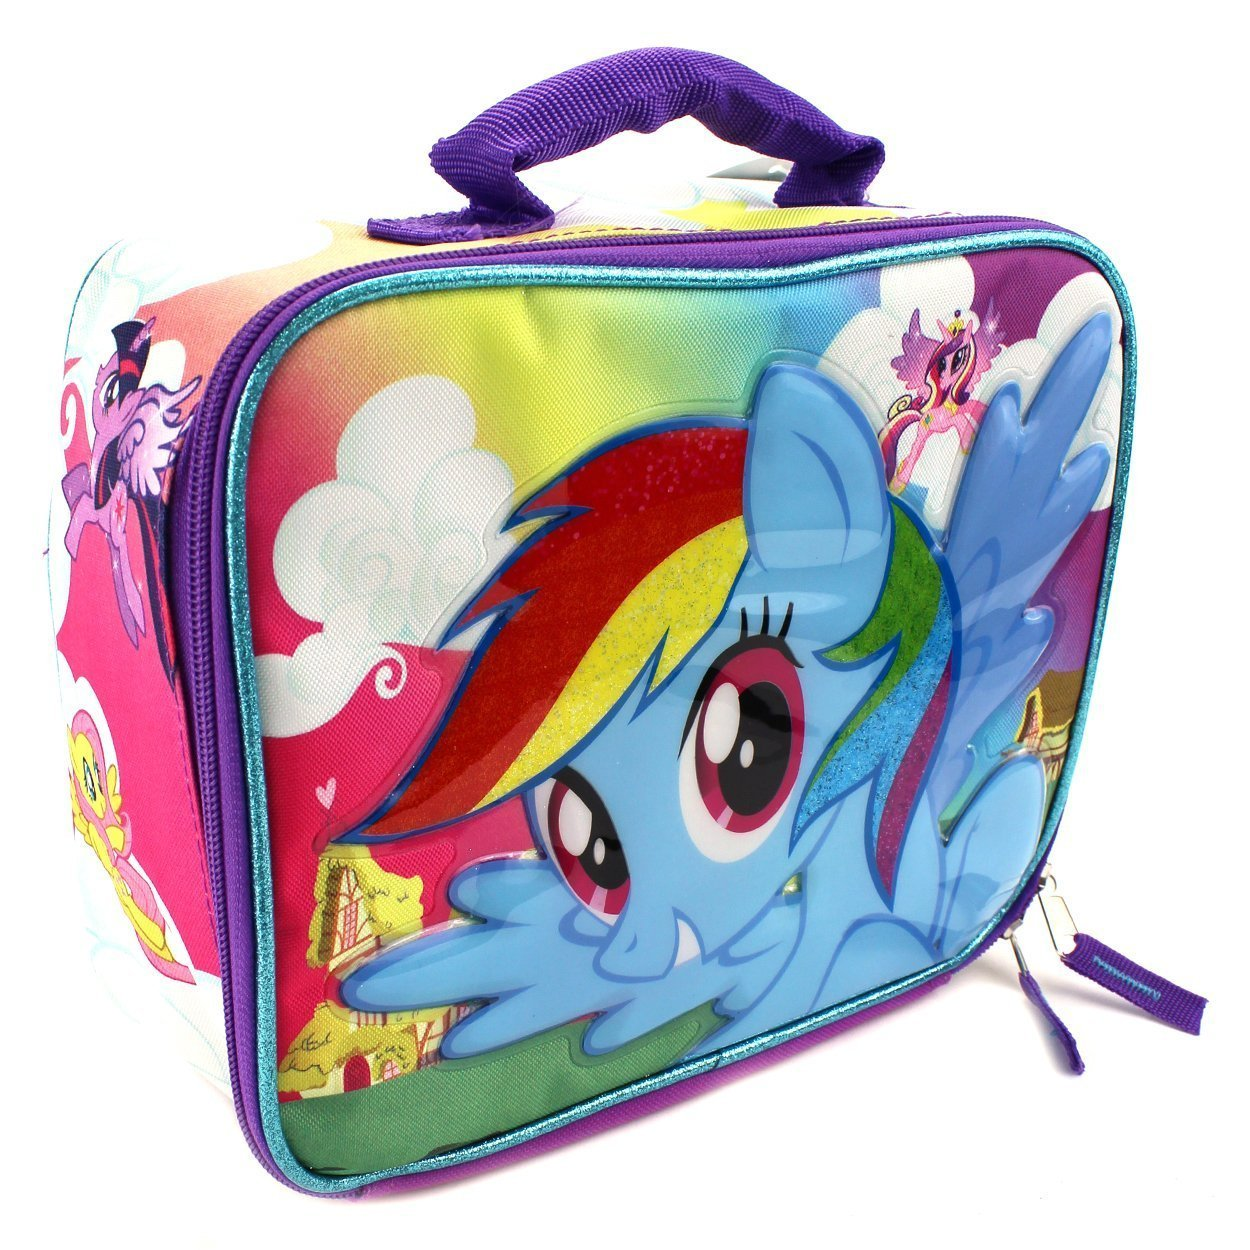 8439da0202 Get Quotations · My Little Pony Soft Lunch Box (Rainbow Dash)